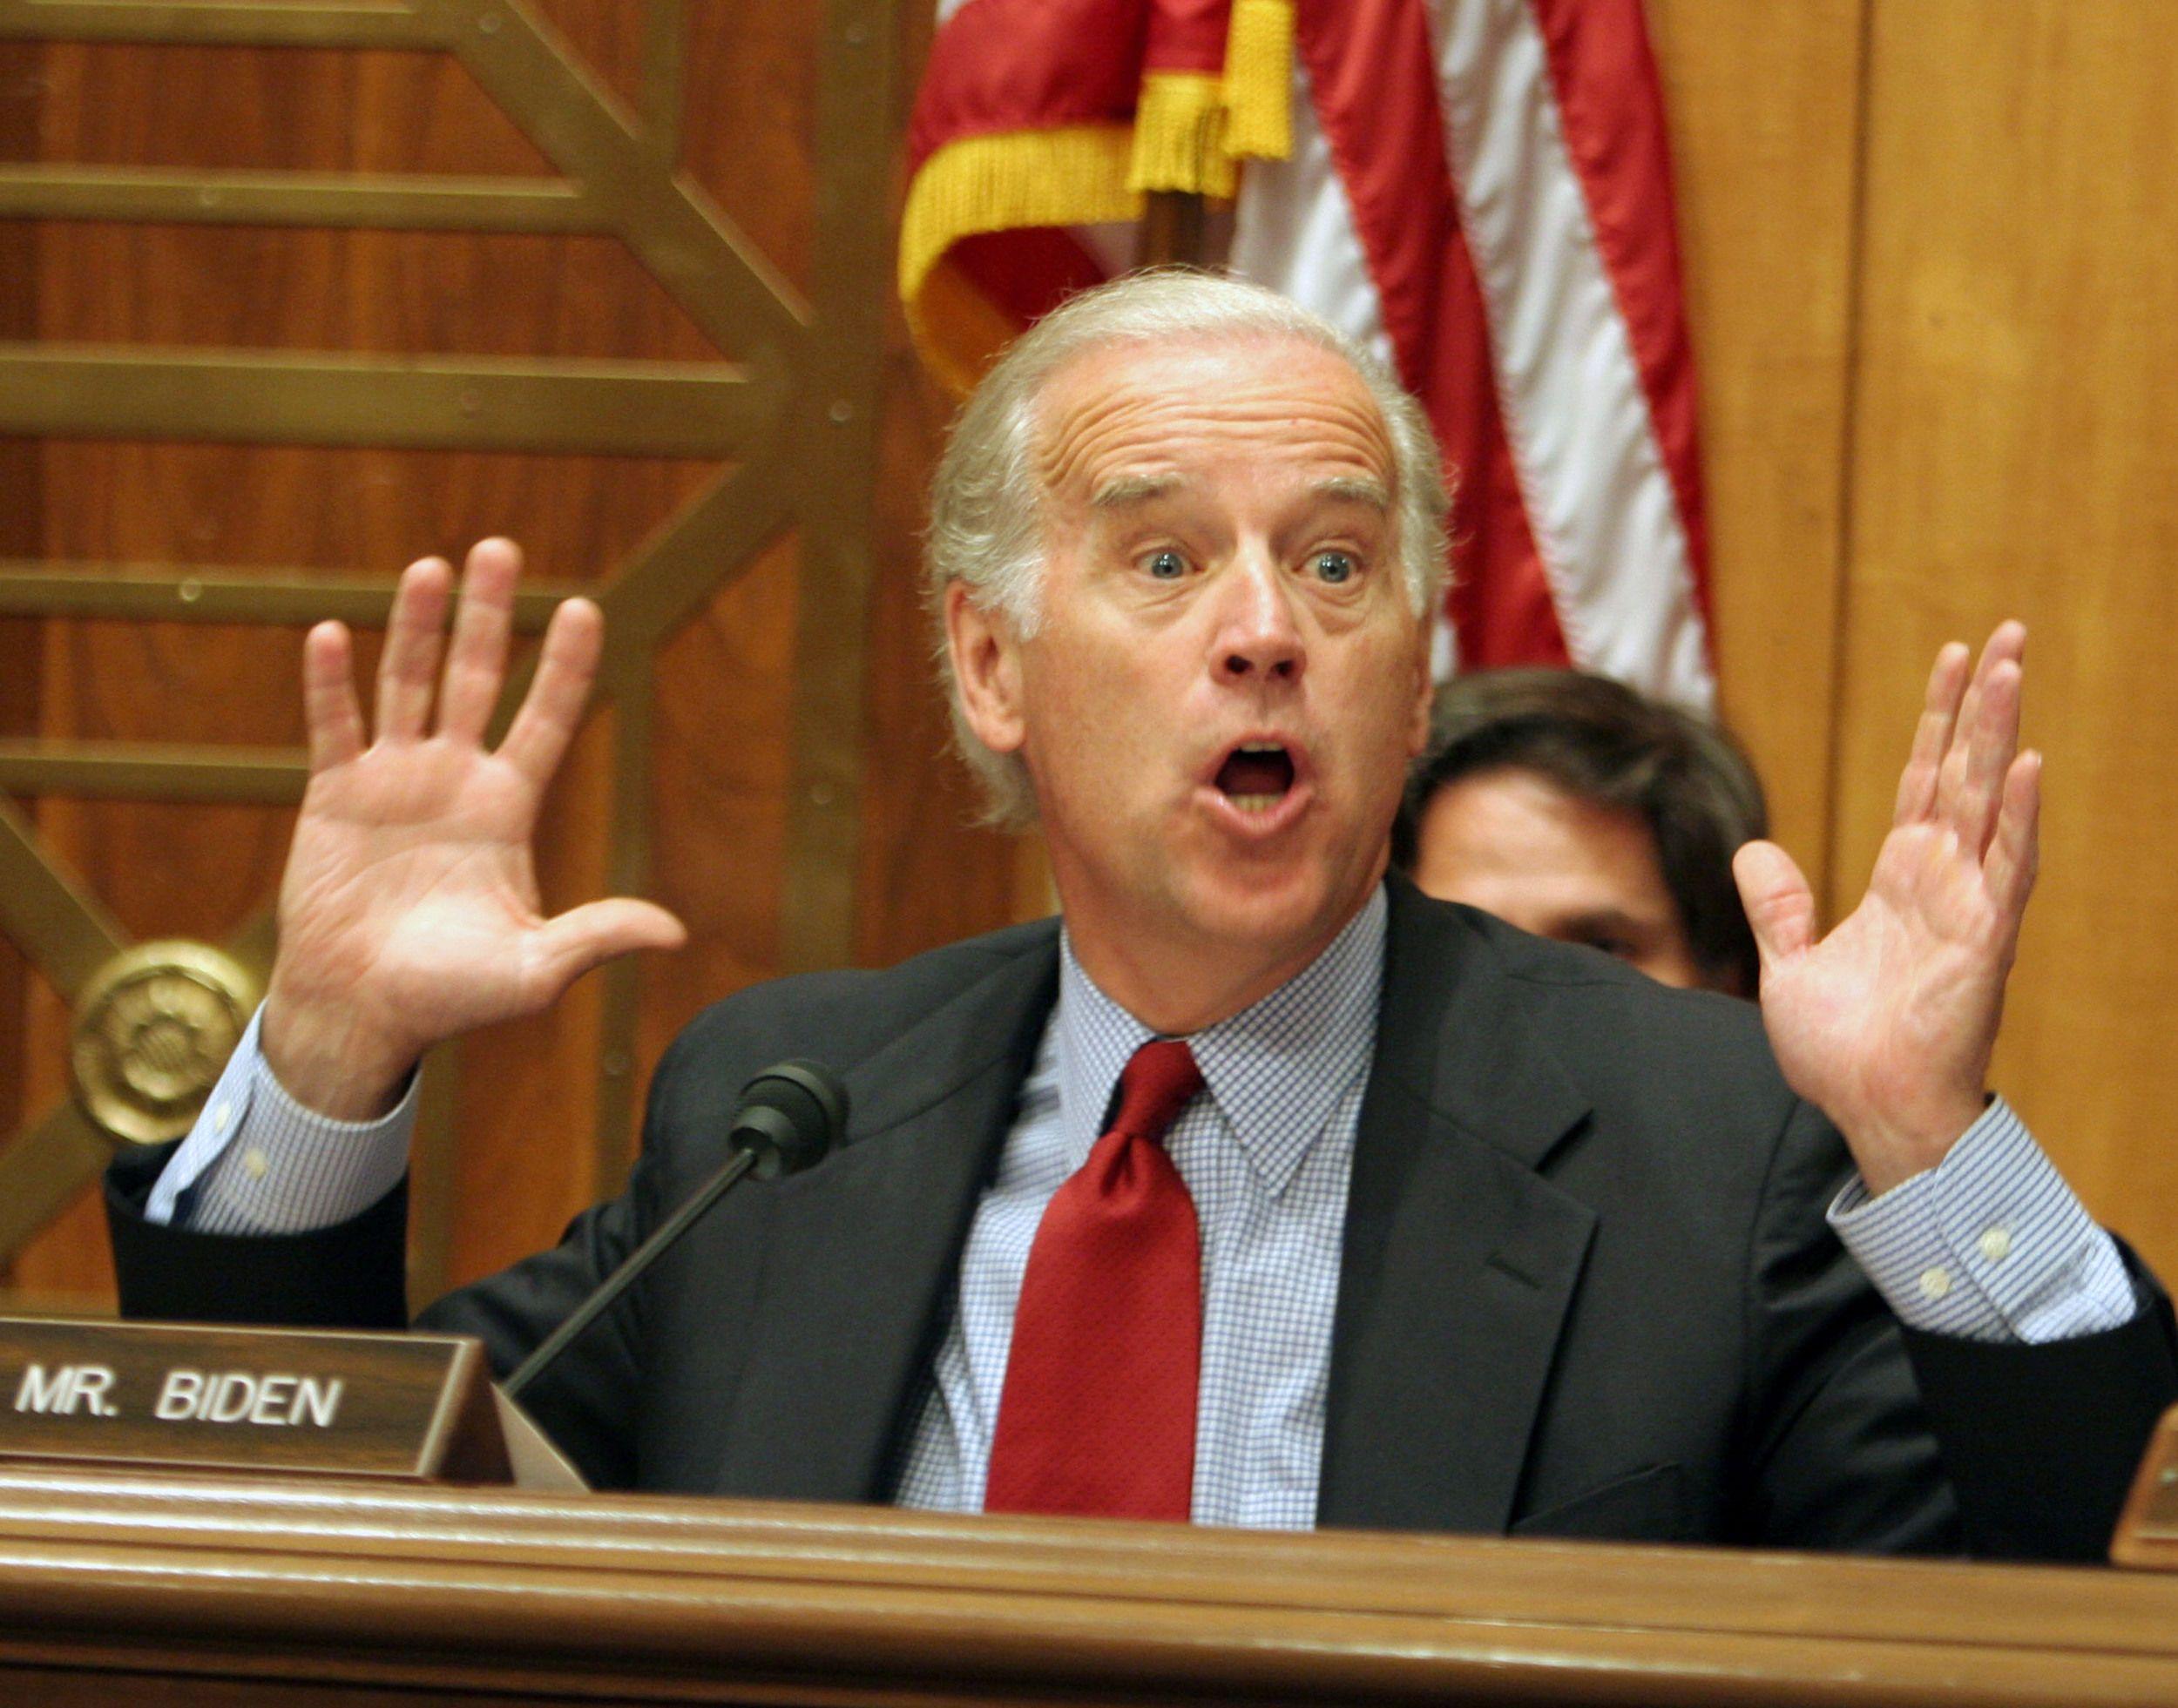 Joe Biden Throws Unexpected Jab At Trump In Speech Joe Biden Vice Trump